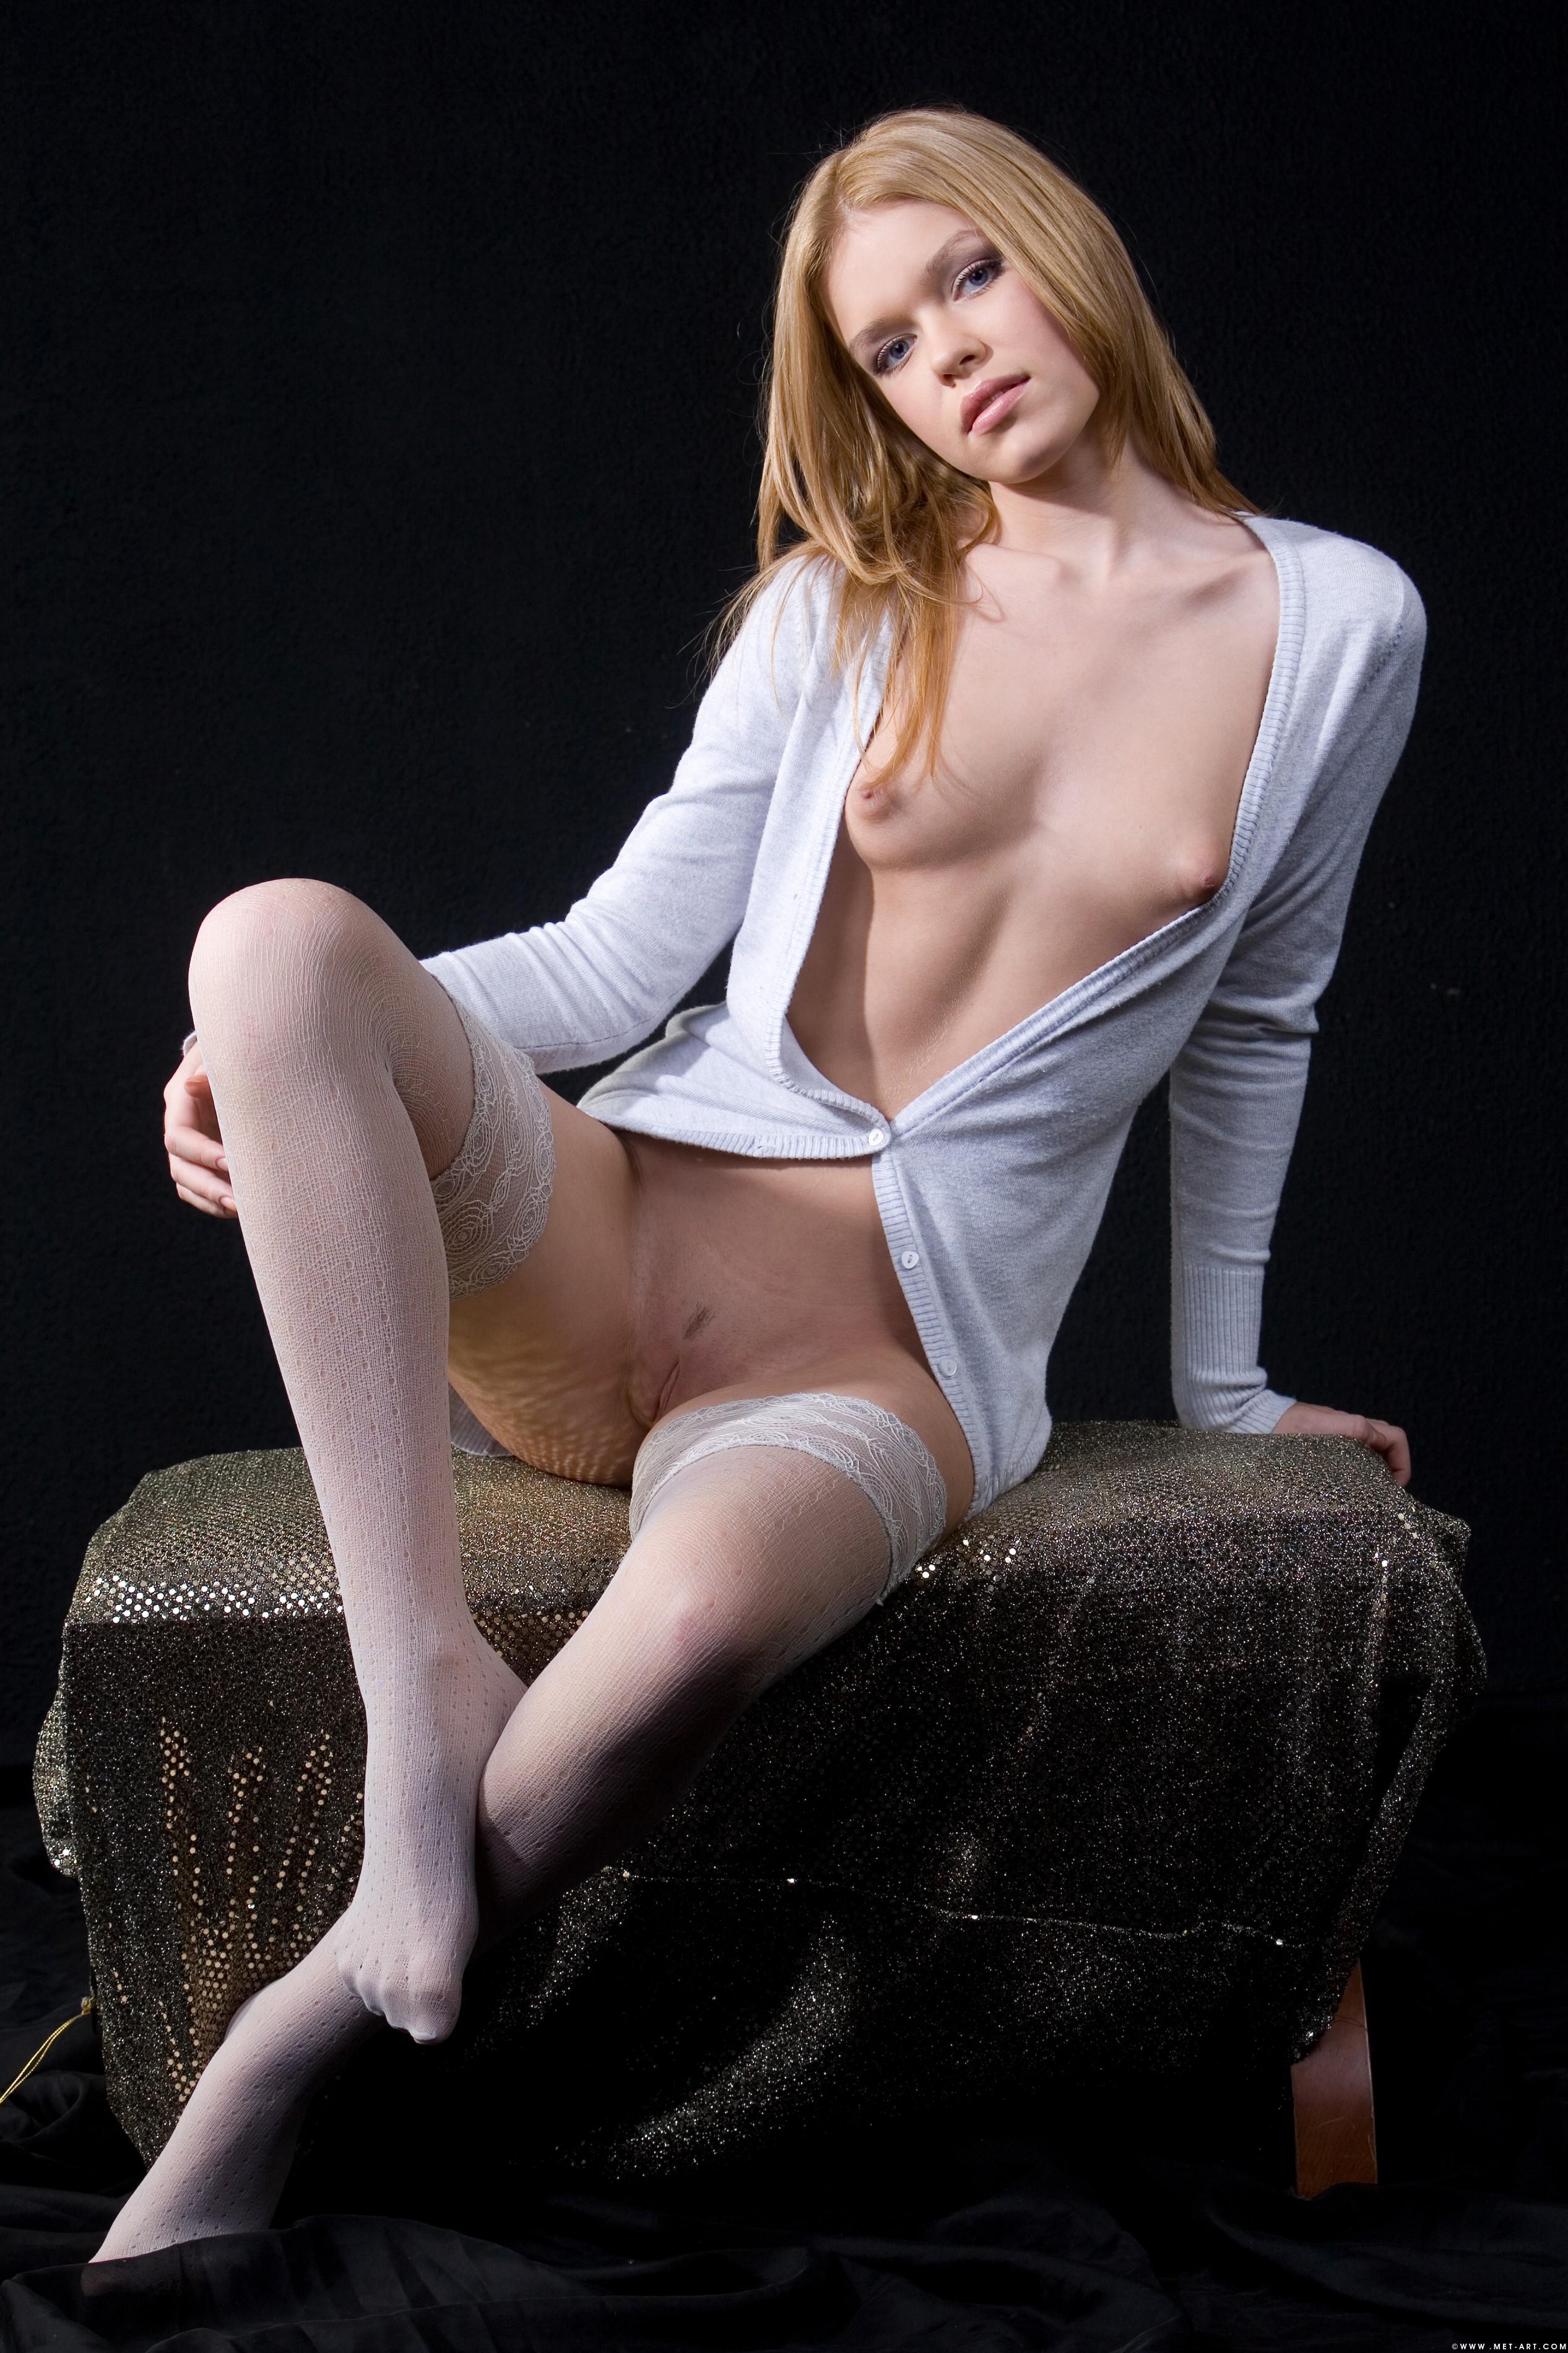 v-bluzke-bez-trusikov-foto-porno